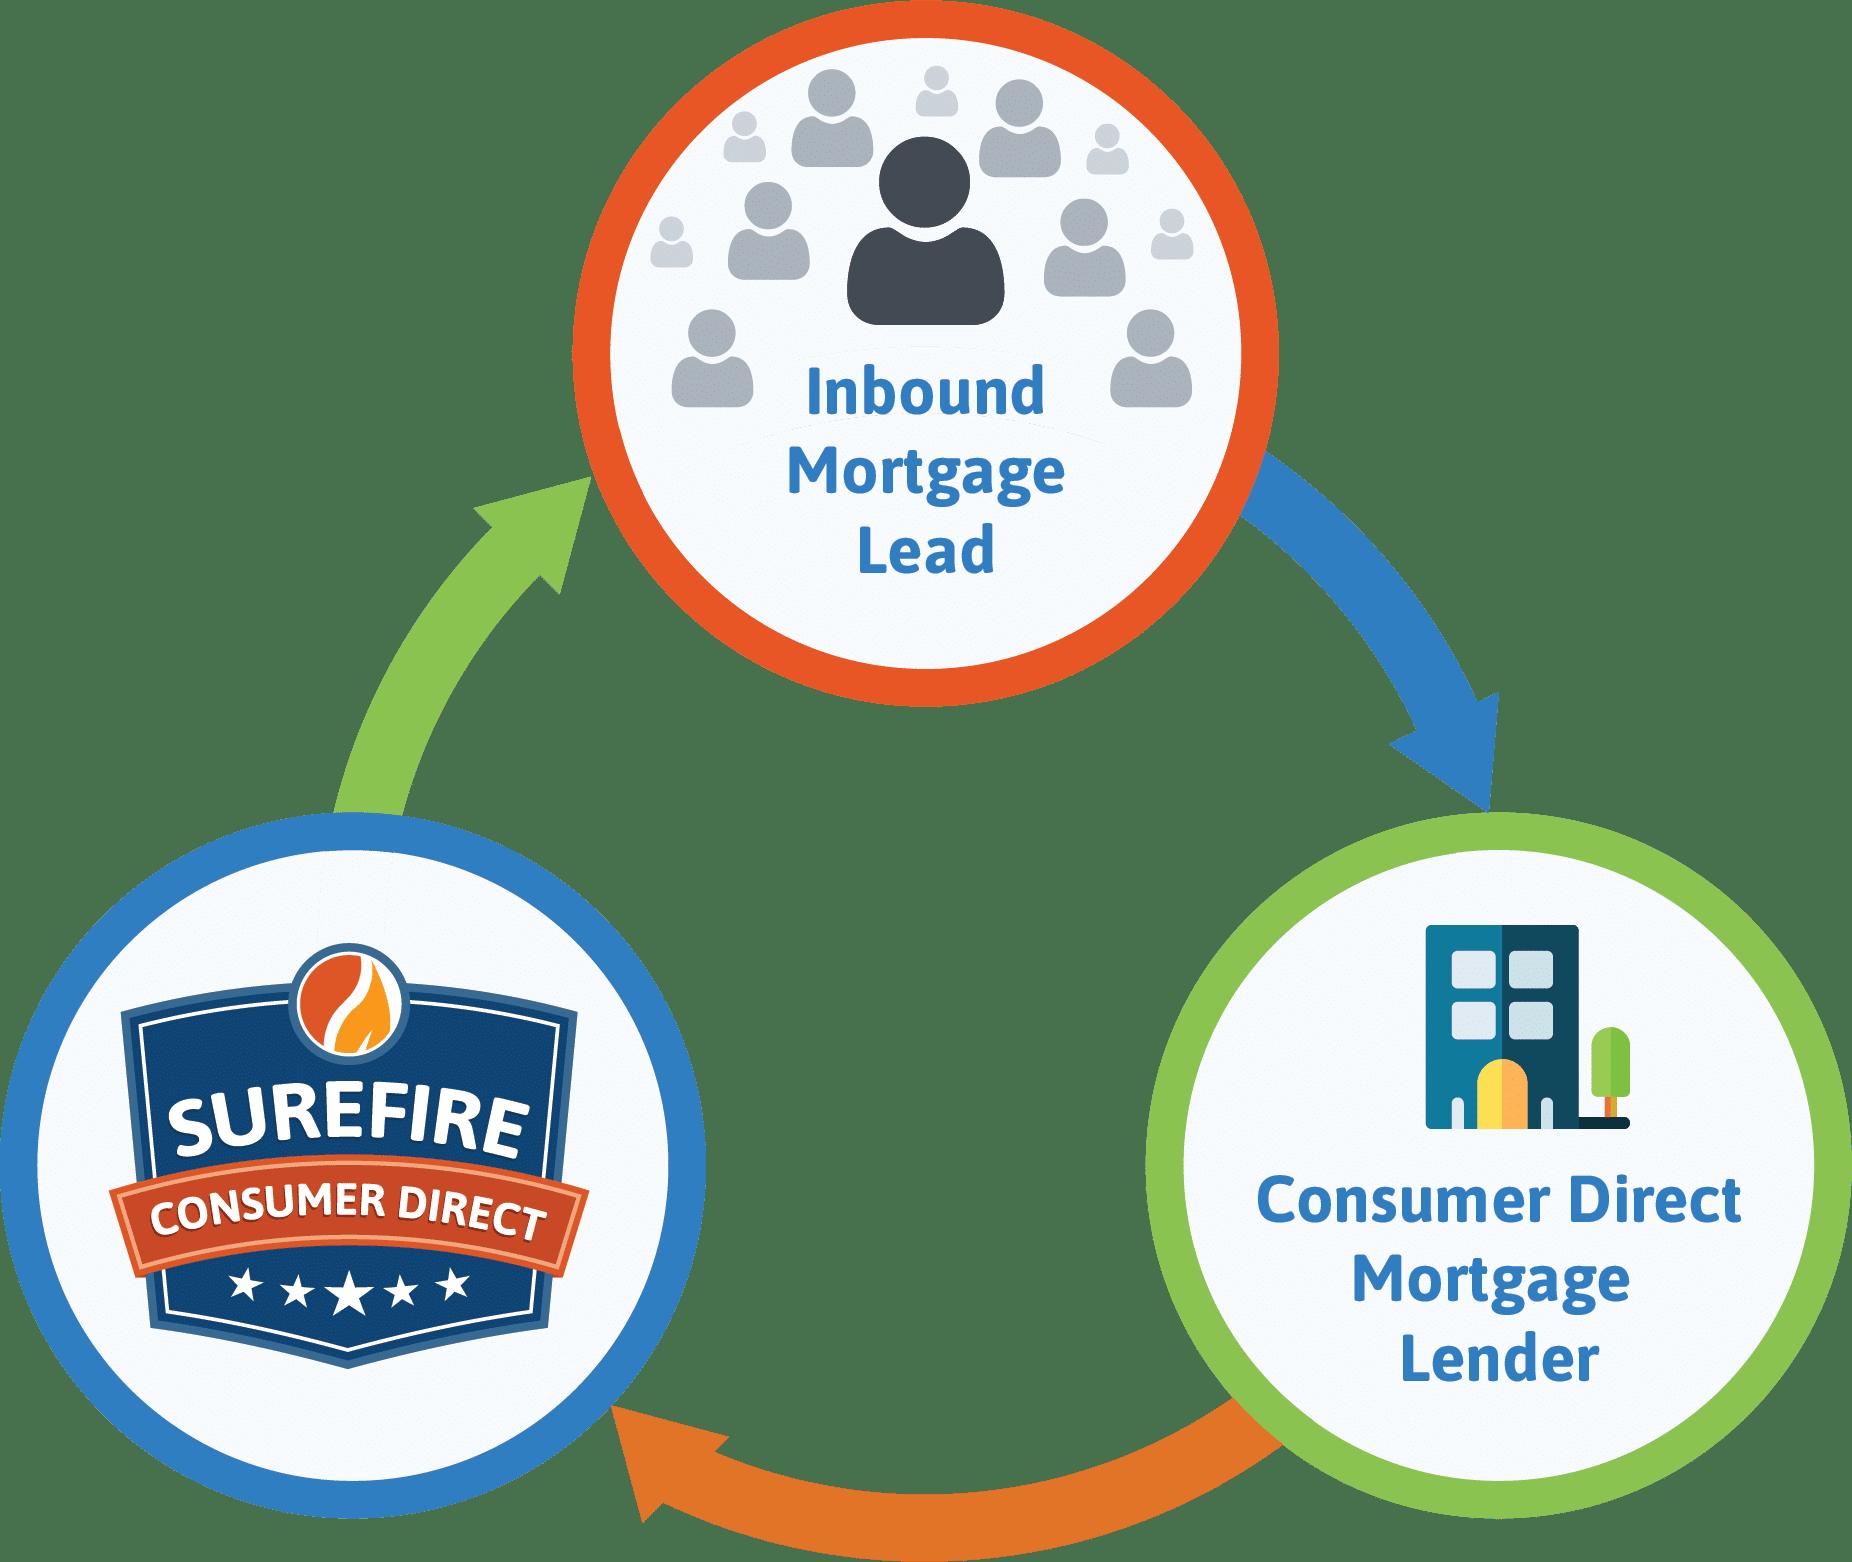 Consumer Direct Mortgage Lender